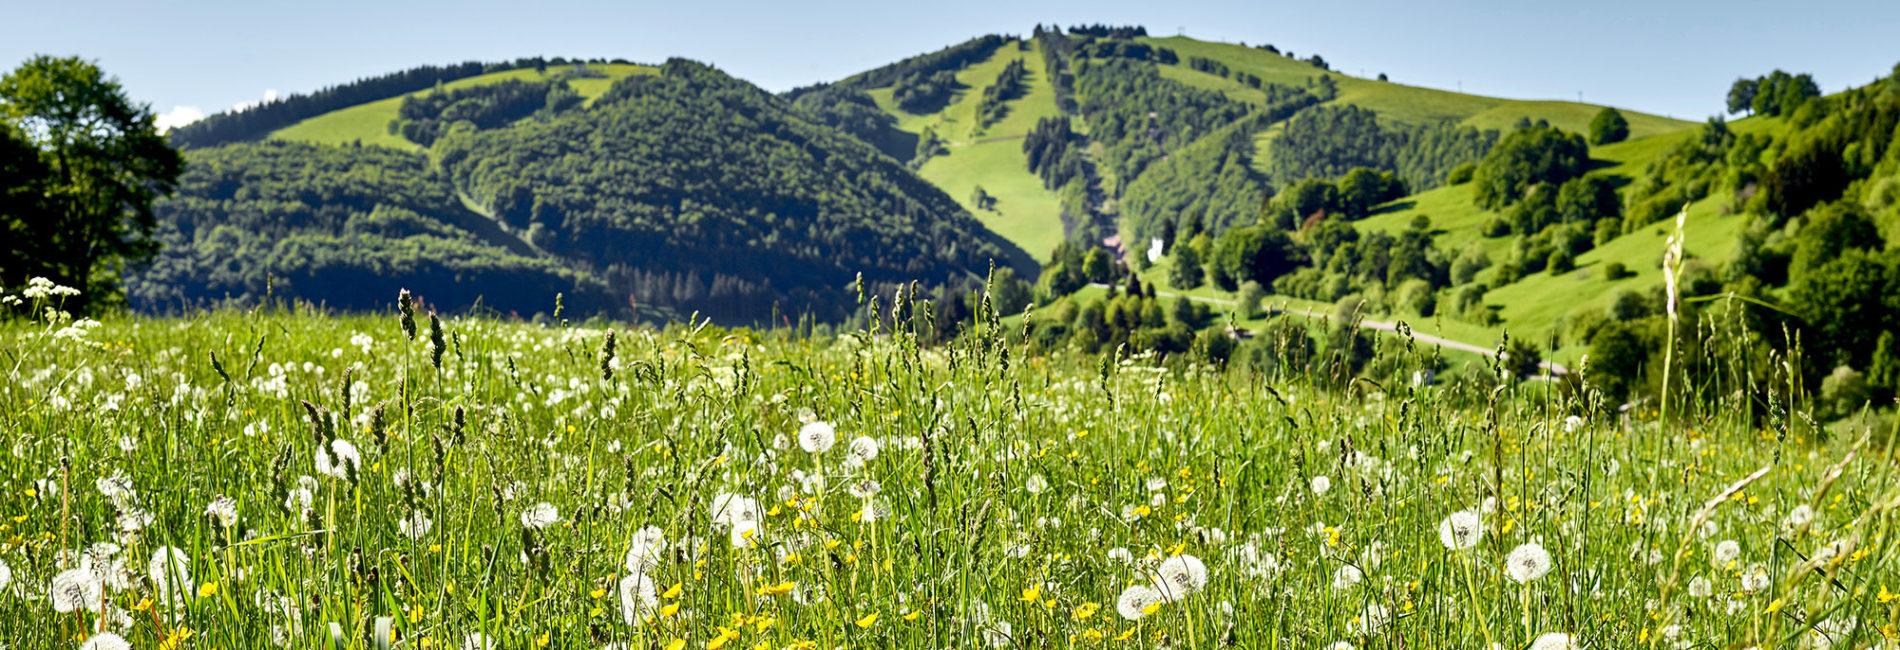 Rete Natura 2000 - Monte Baldo